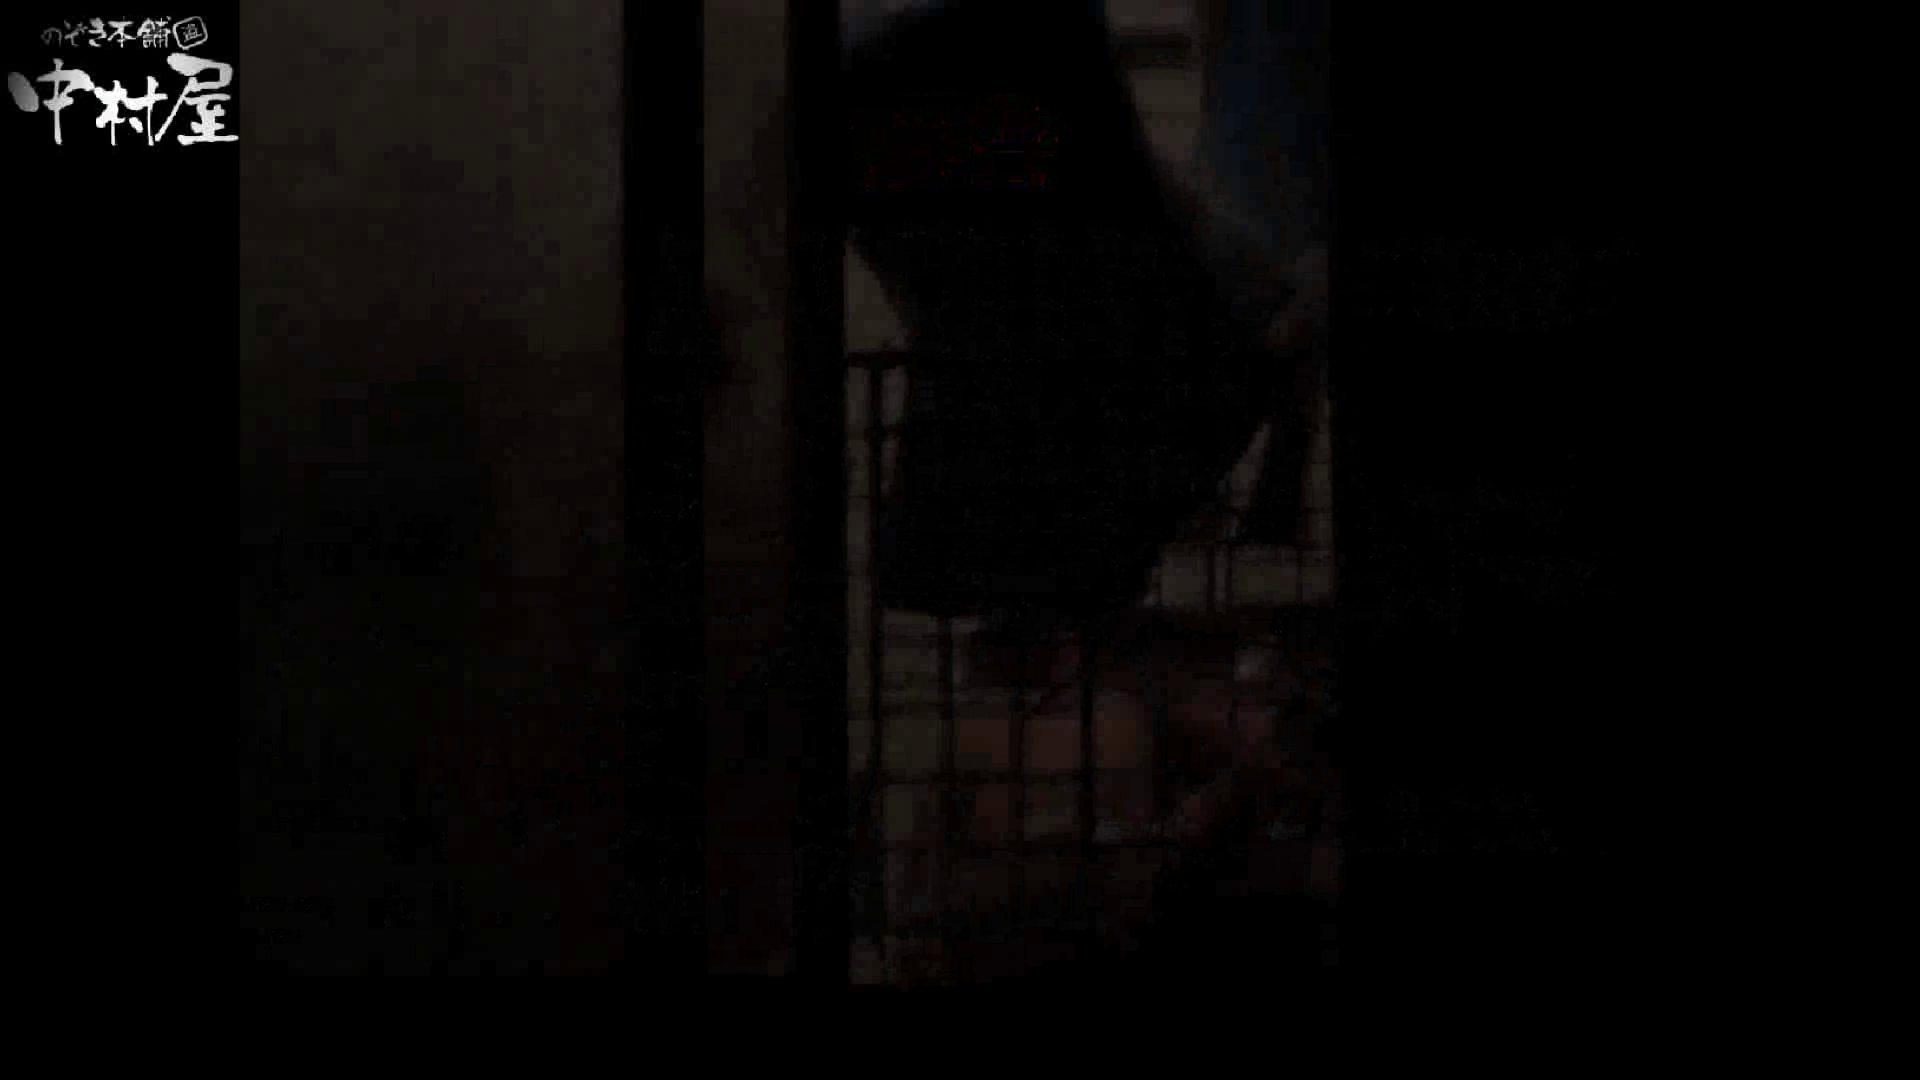 民家風呂専門盗撮師の超危険映像 vol.023 OLのエロ生活 性交動画流出 95連発 26